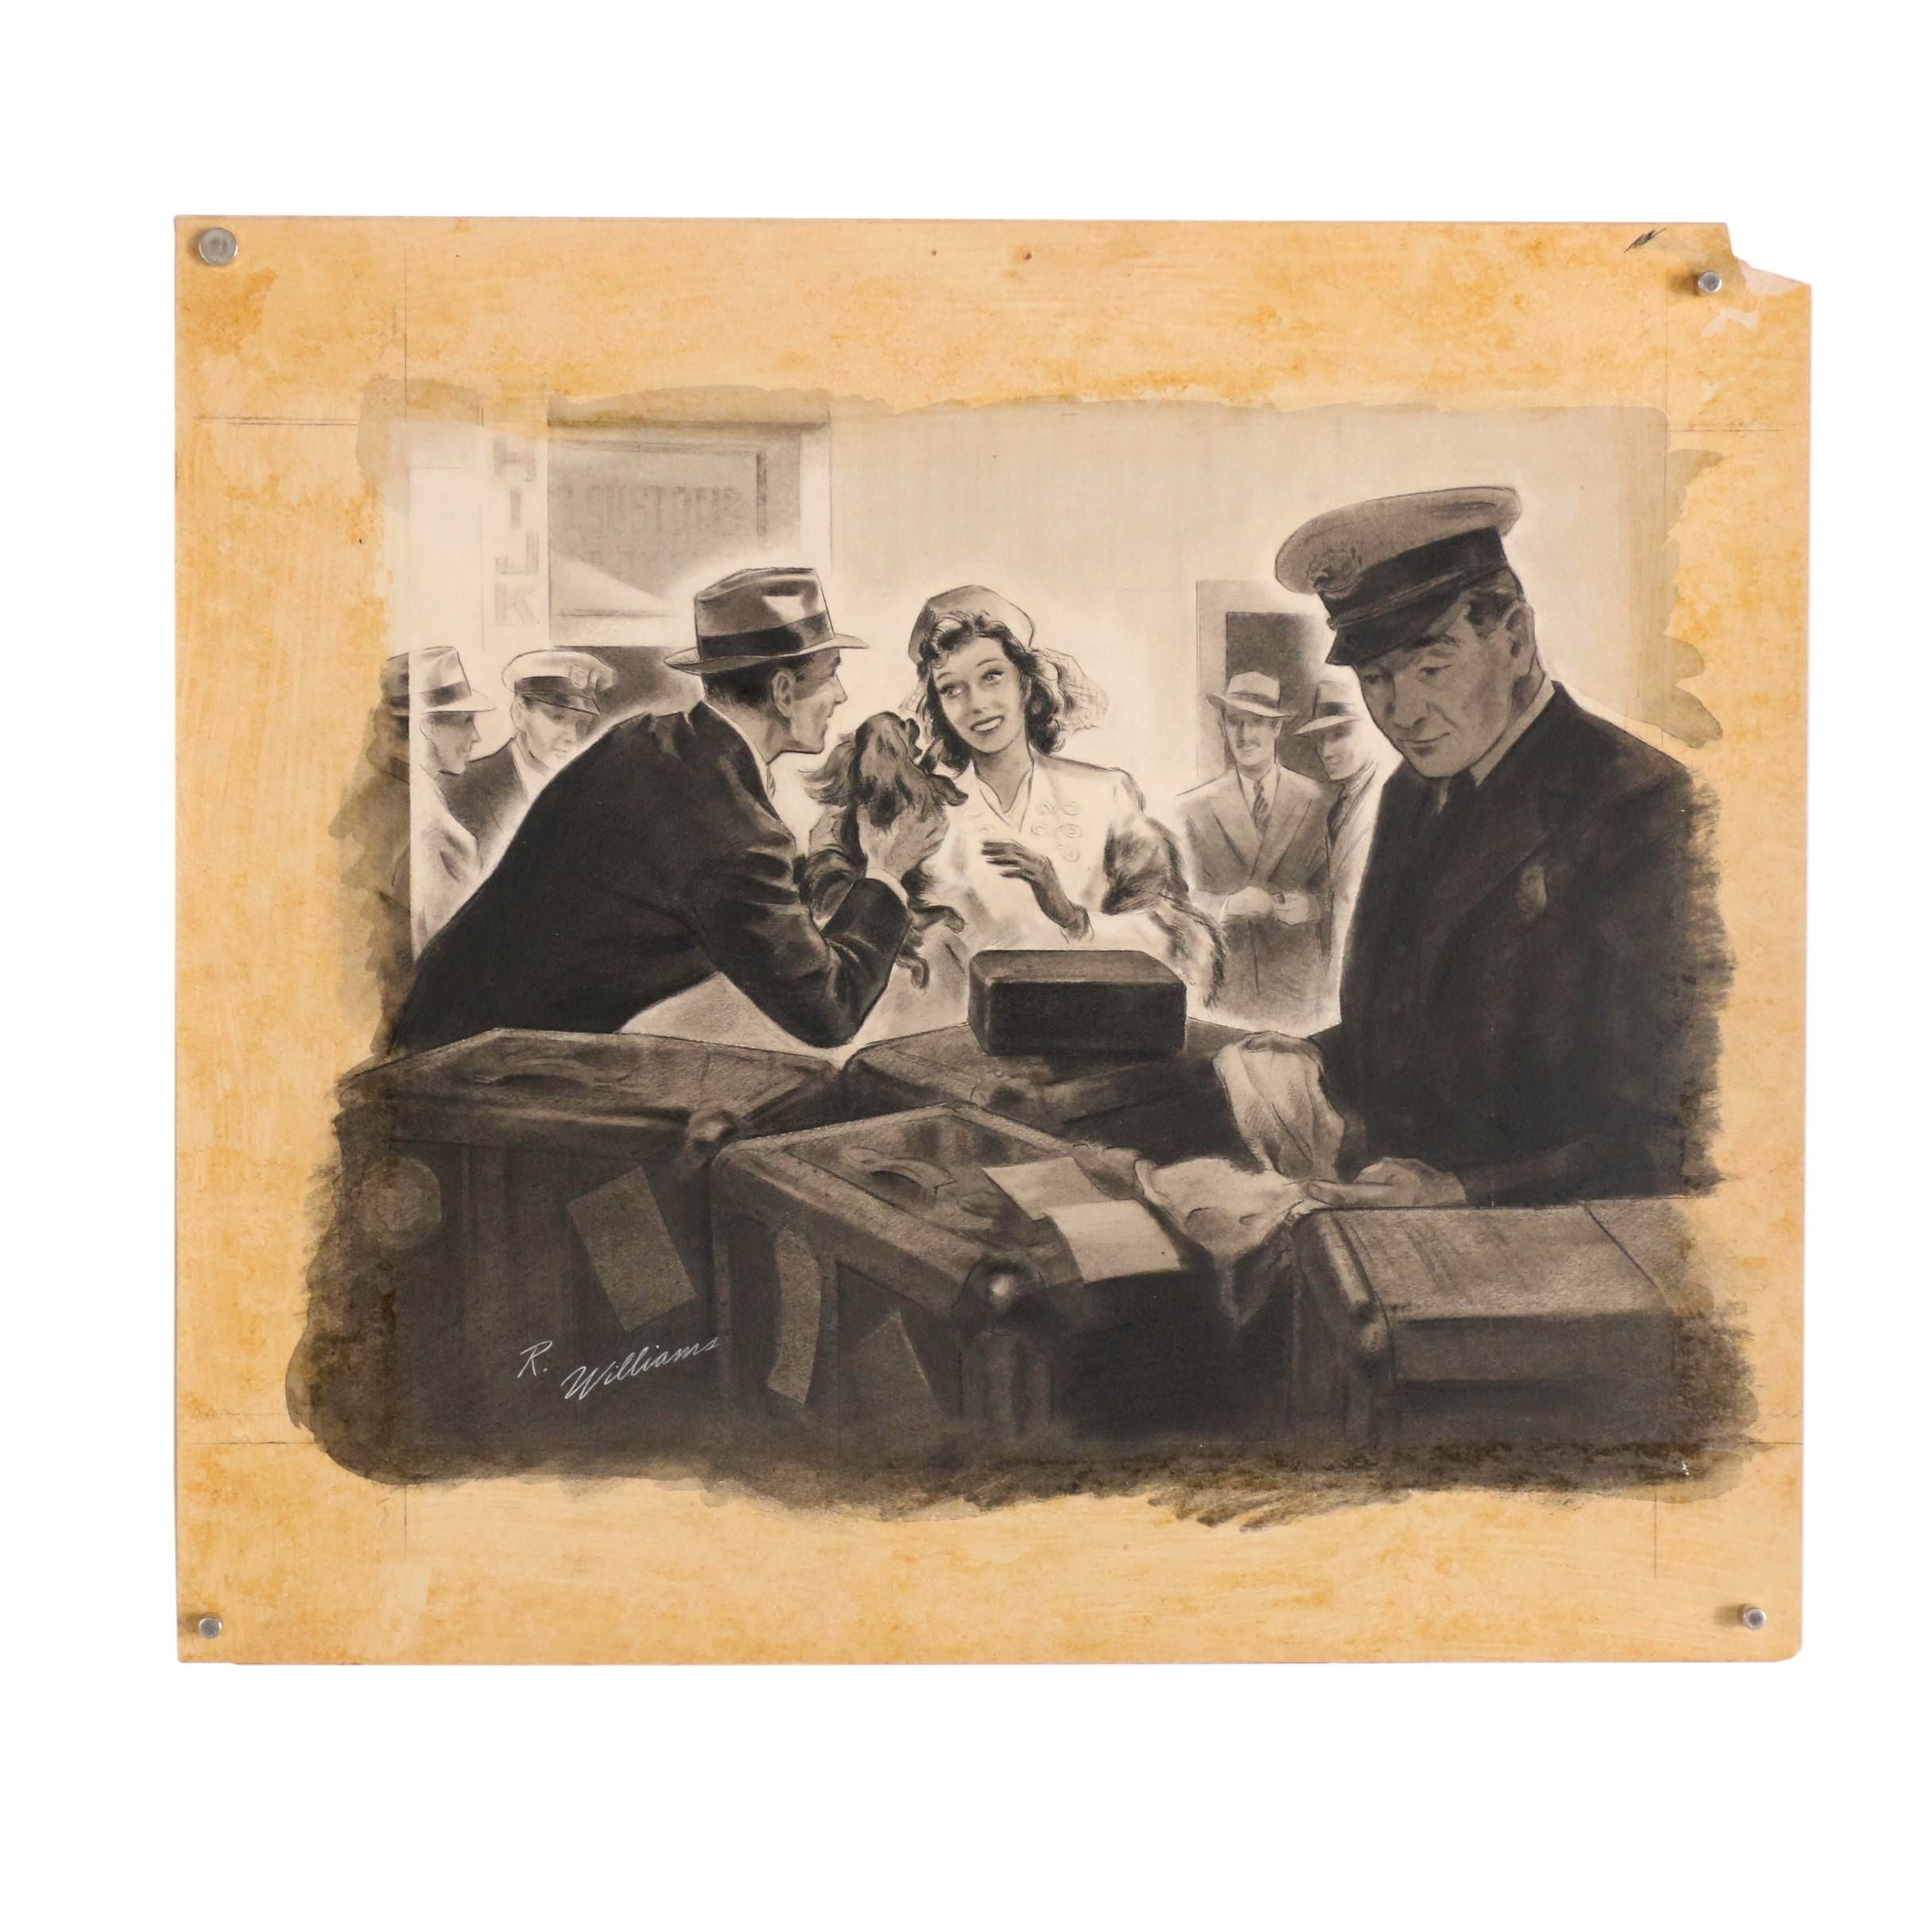 Richard F. Williams Ink and Charcoal Illustration of Travel Genre Scene